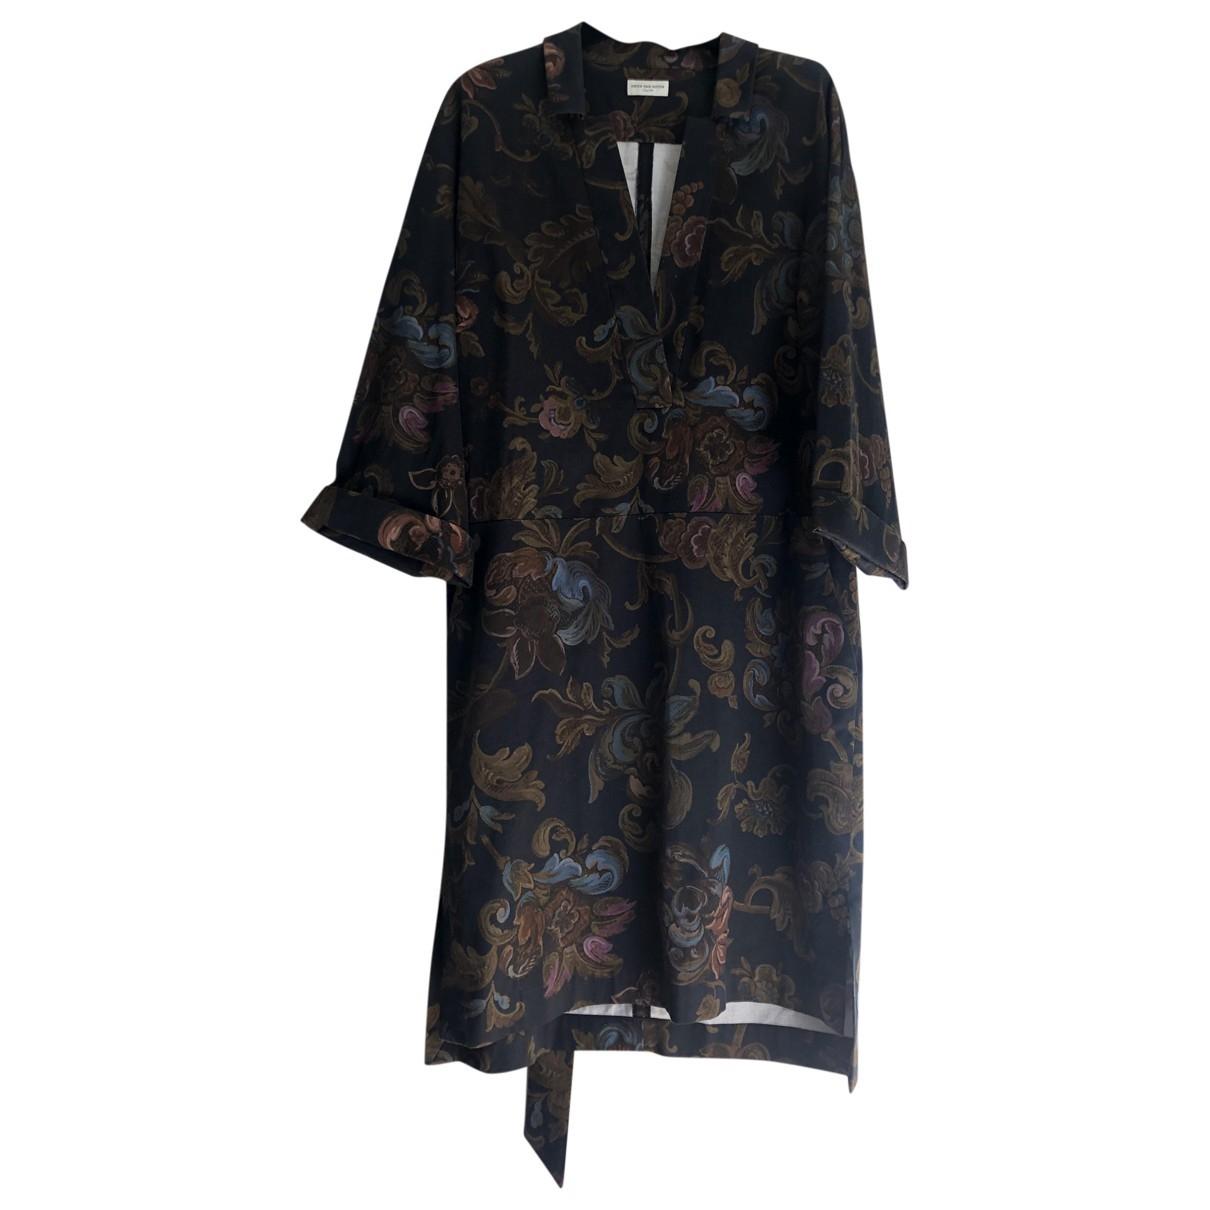 Dries Van Noten \N Brown Cotton - elasthane dress for Women 48 IT